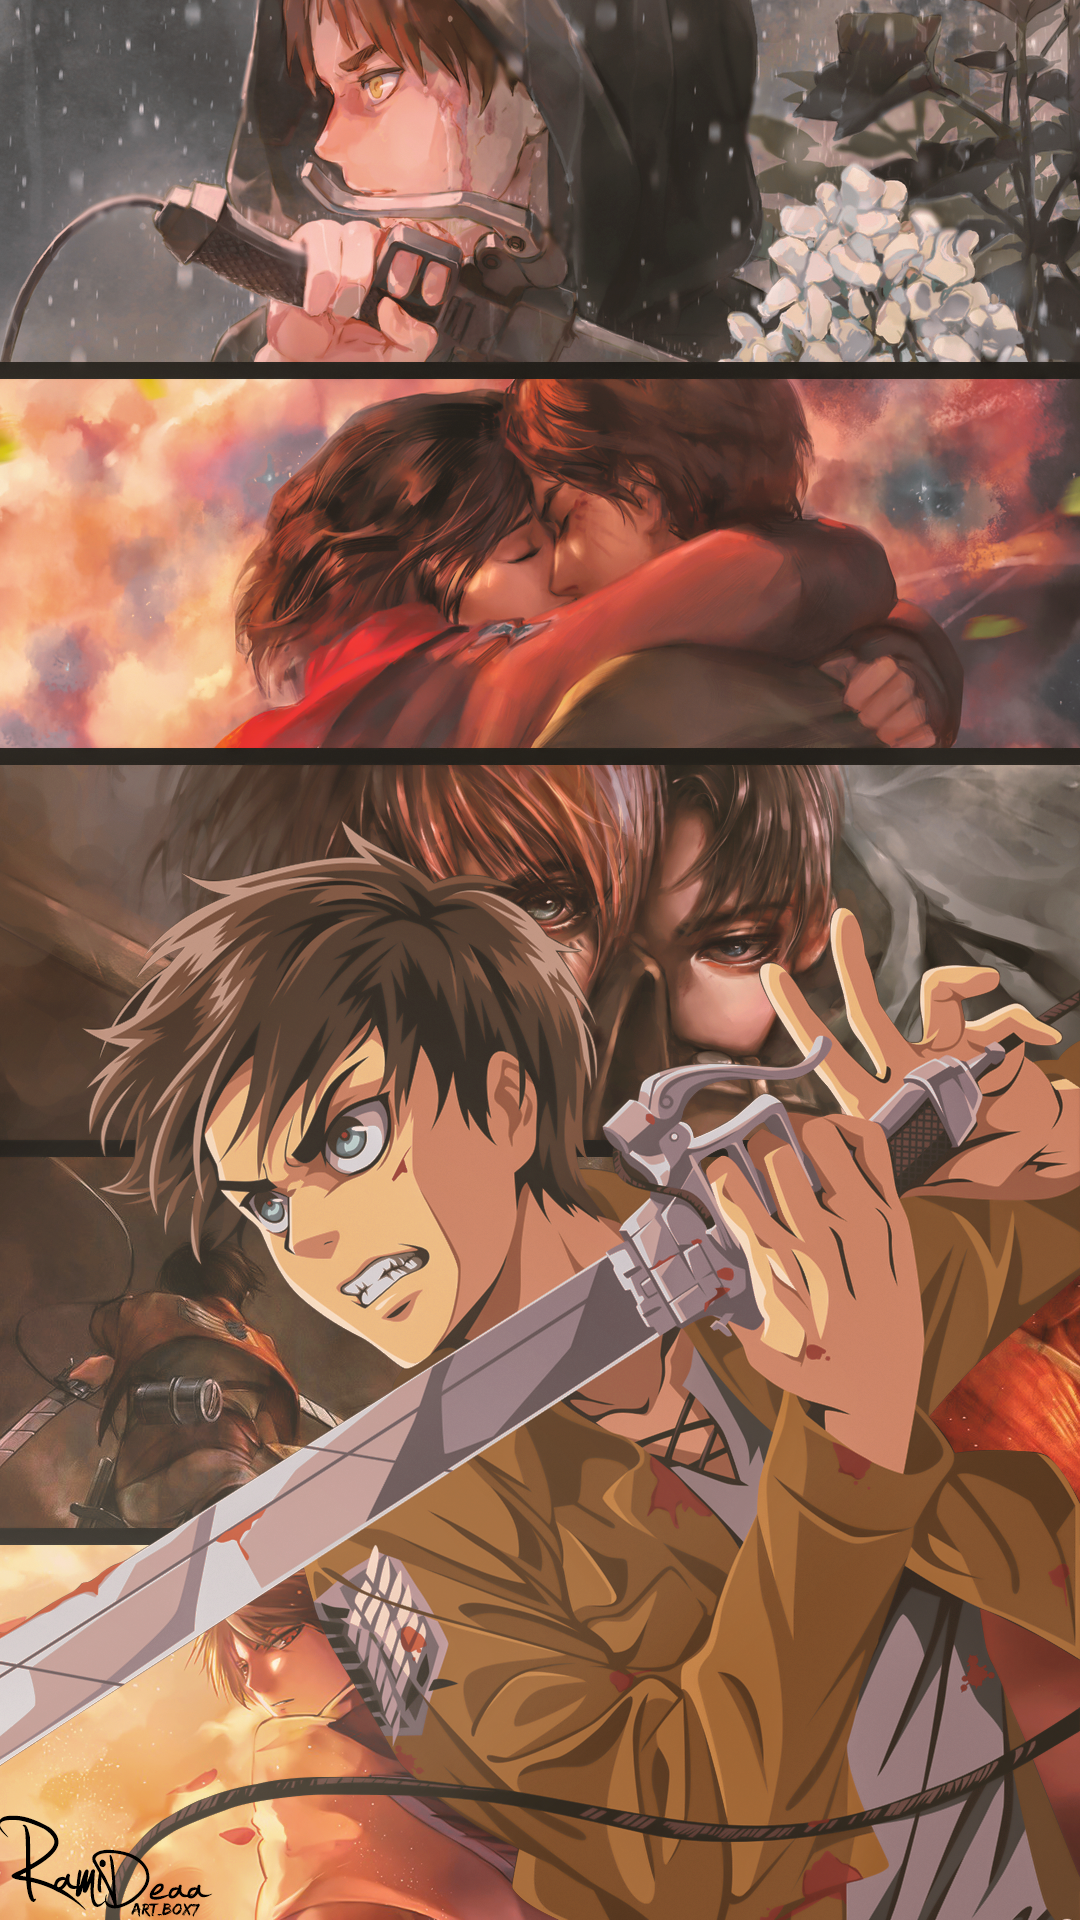 Eren Attack On Titan Dibujos Japoneses Shingeky Ataque De Los Titanes